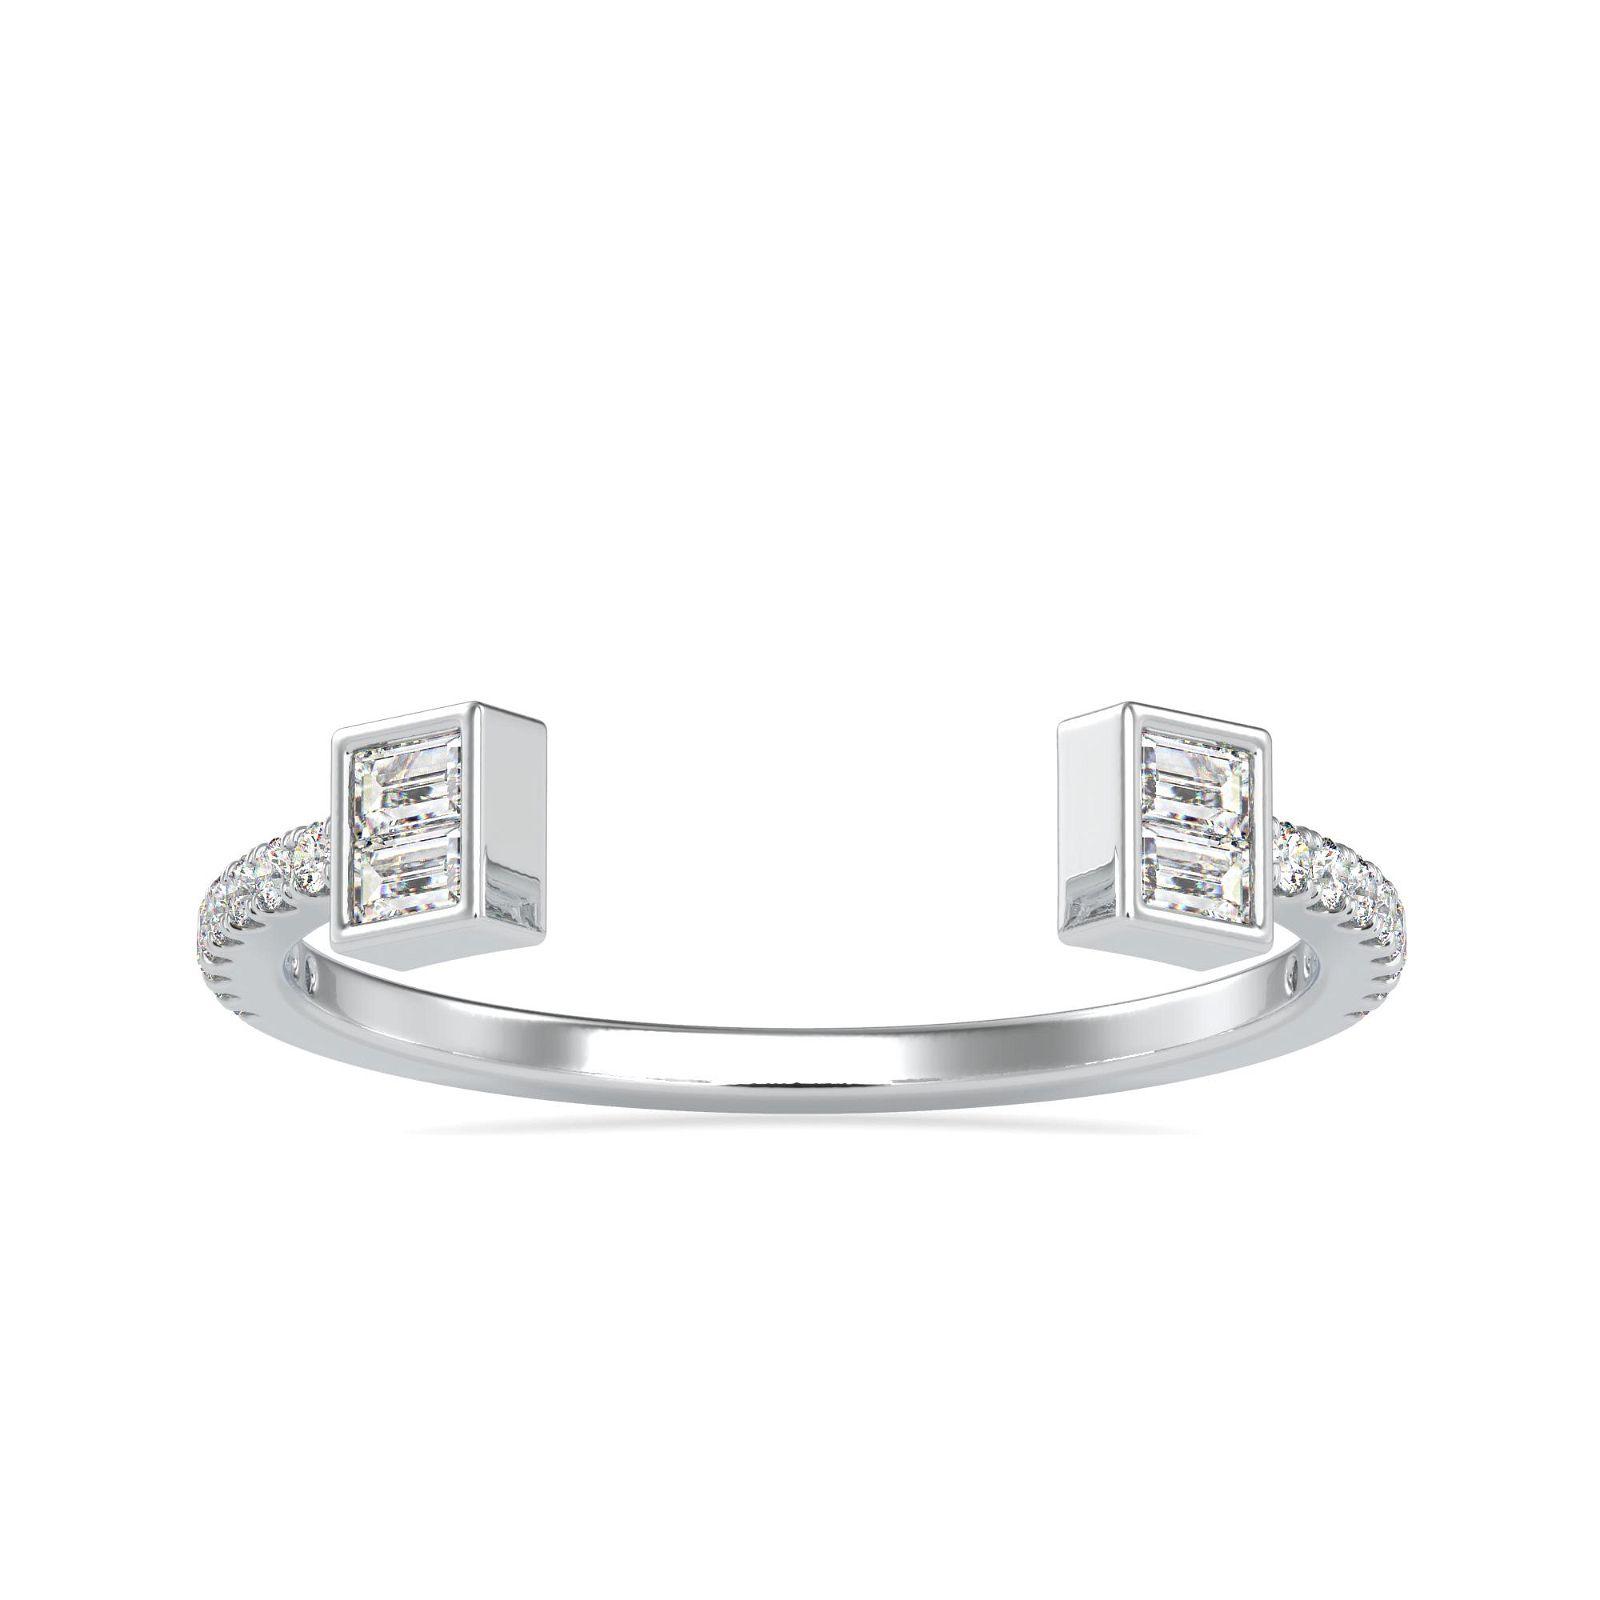 0.25CT Natural Diamond 14K White Gold Ring